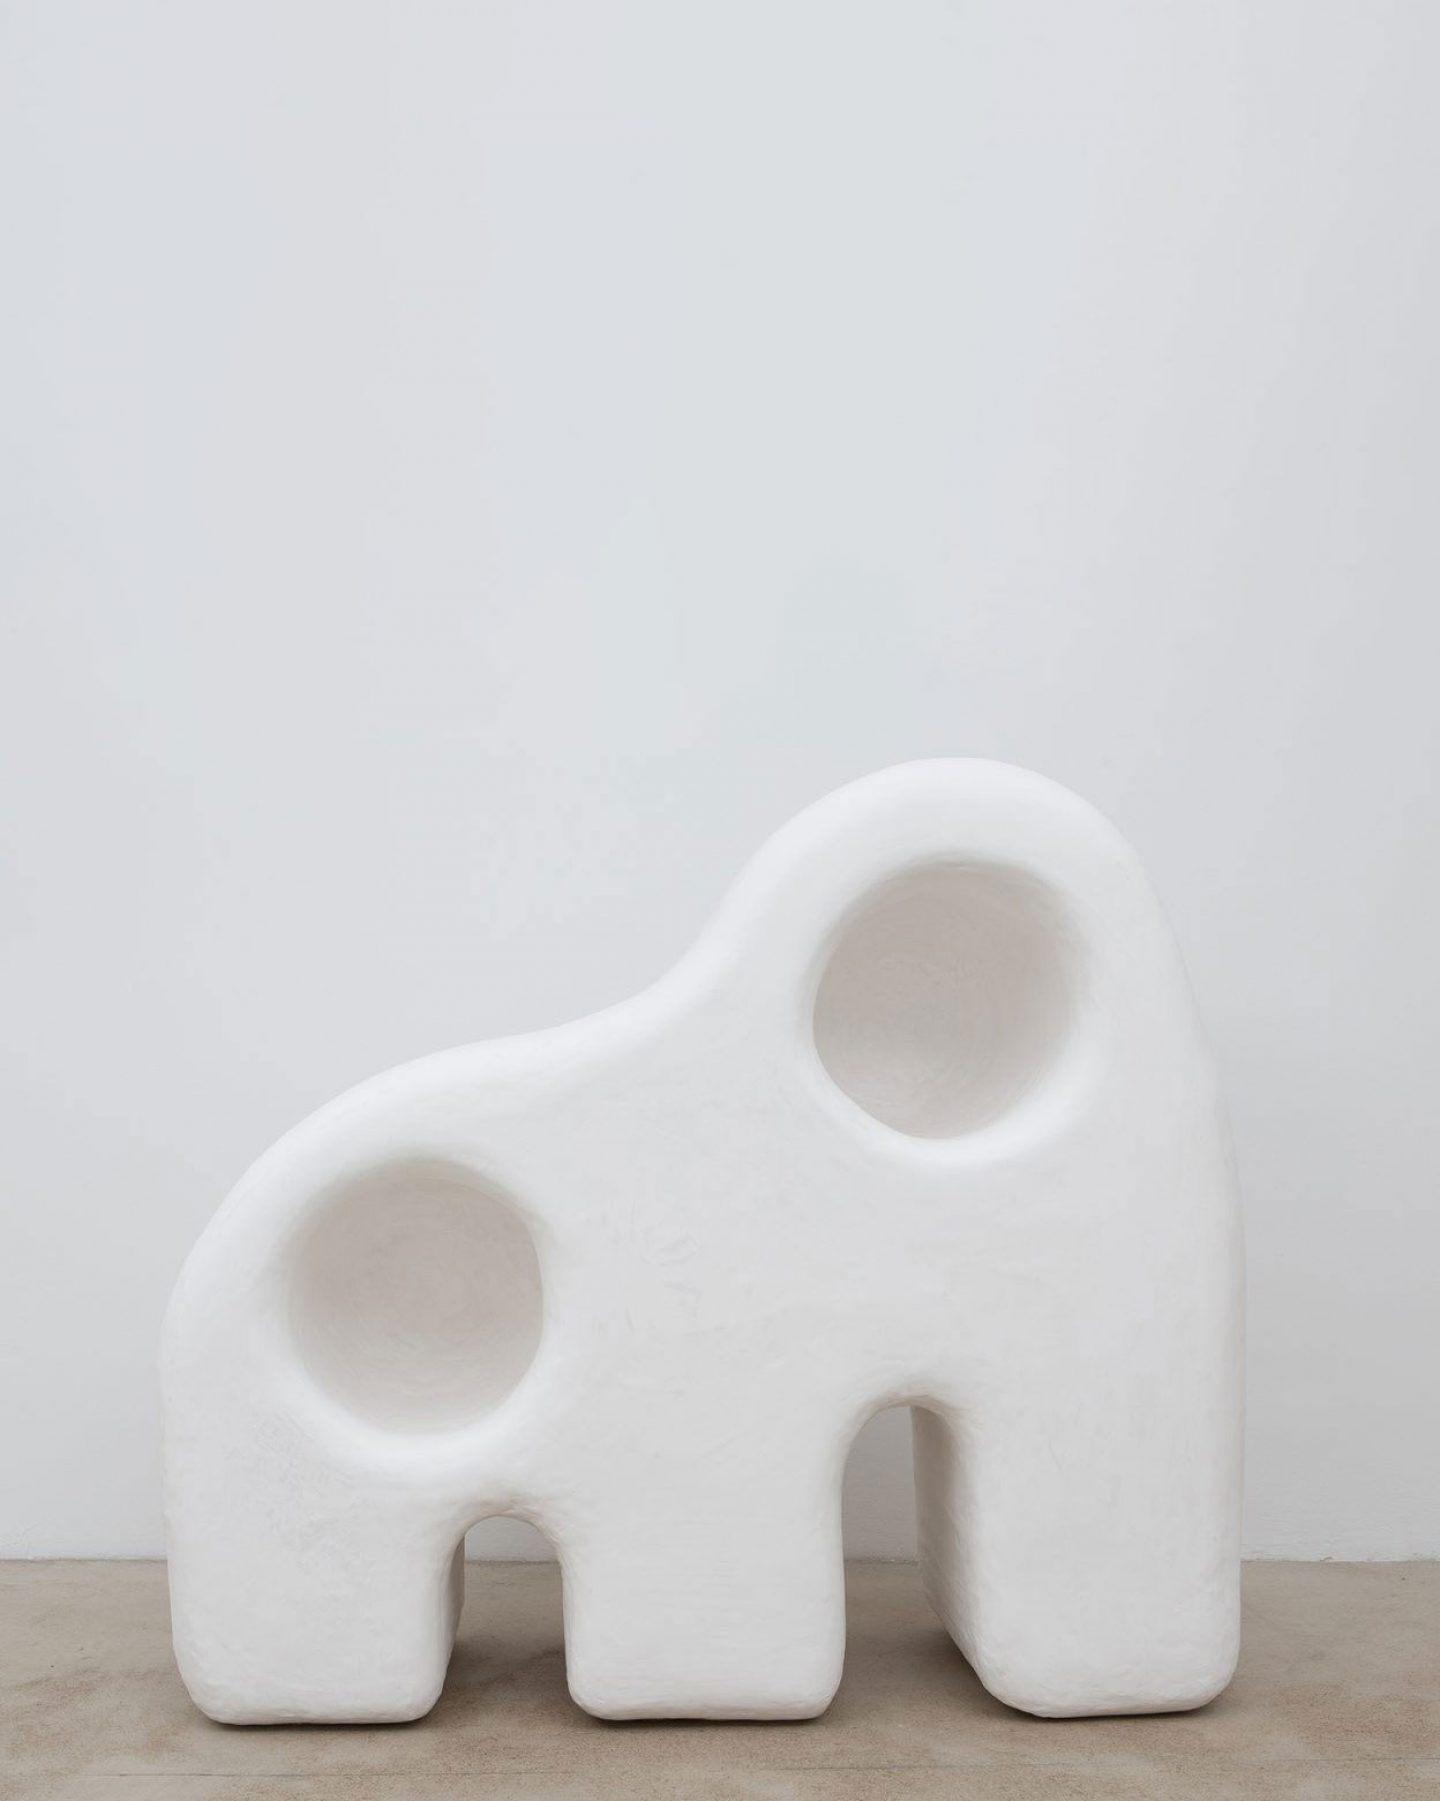 ignant-design-bnag-summloch-5-1440x960